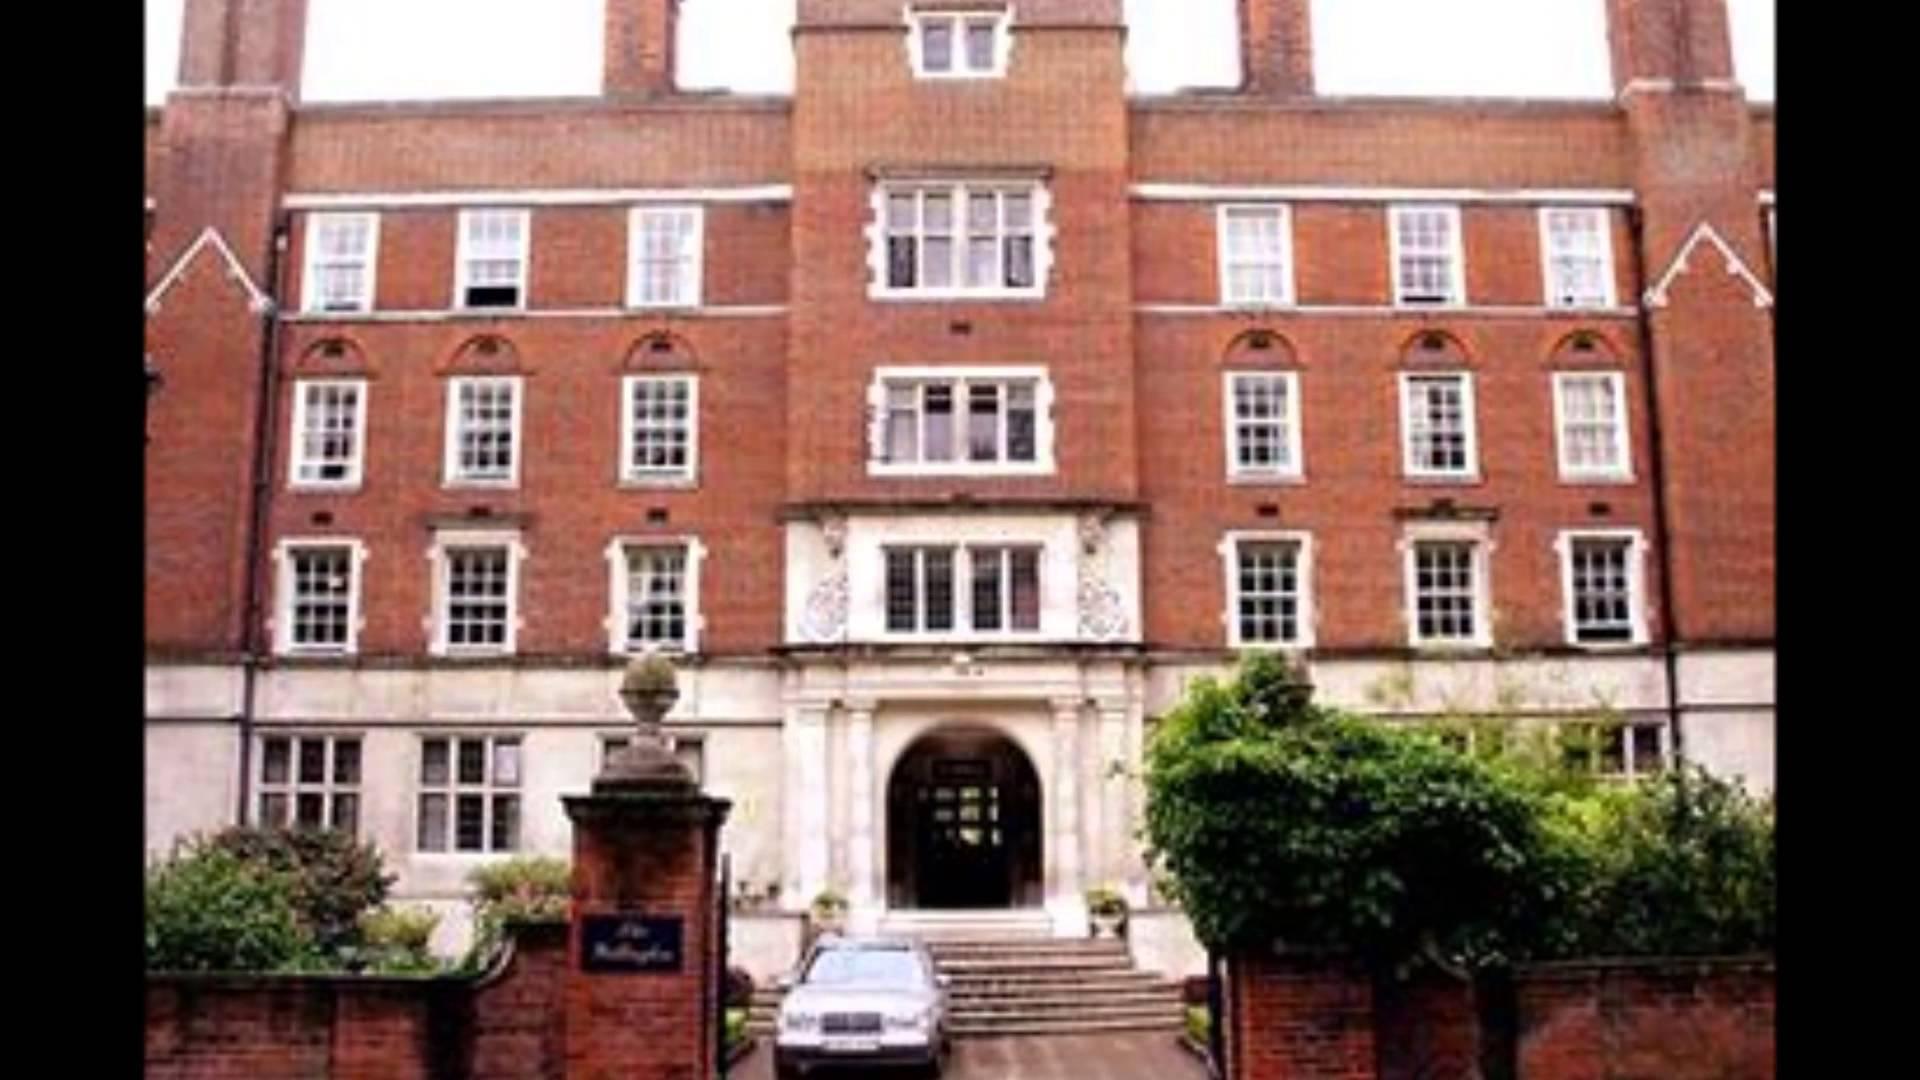 Meeting rooms at grange wellington hotel 71 vincent square london united kingdom - Hotel vincent ...